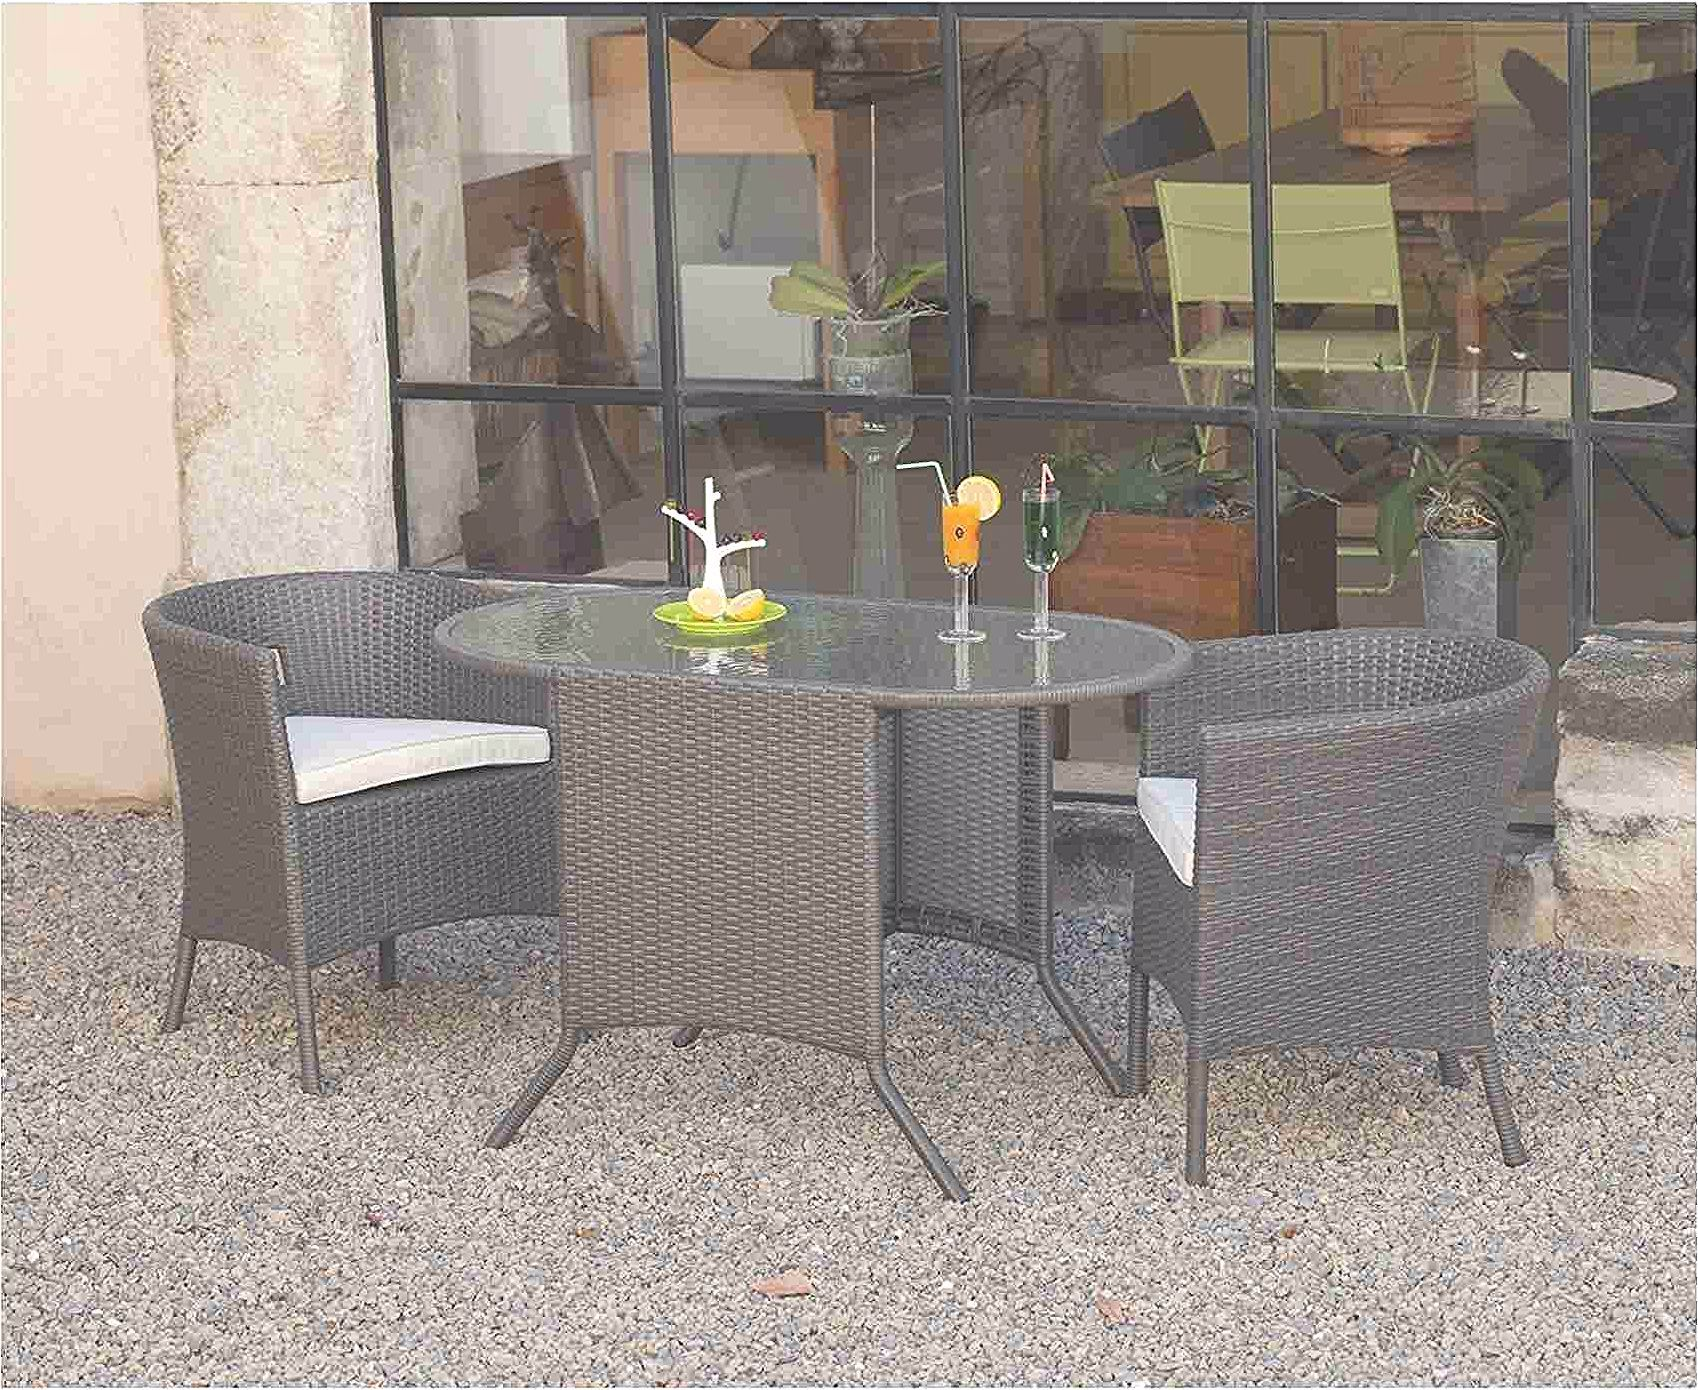 79 Glamorous Mobilier Jardin Leclerc Outdoor Furniture Sets